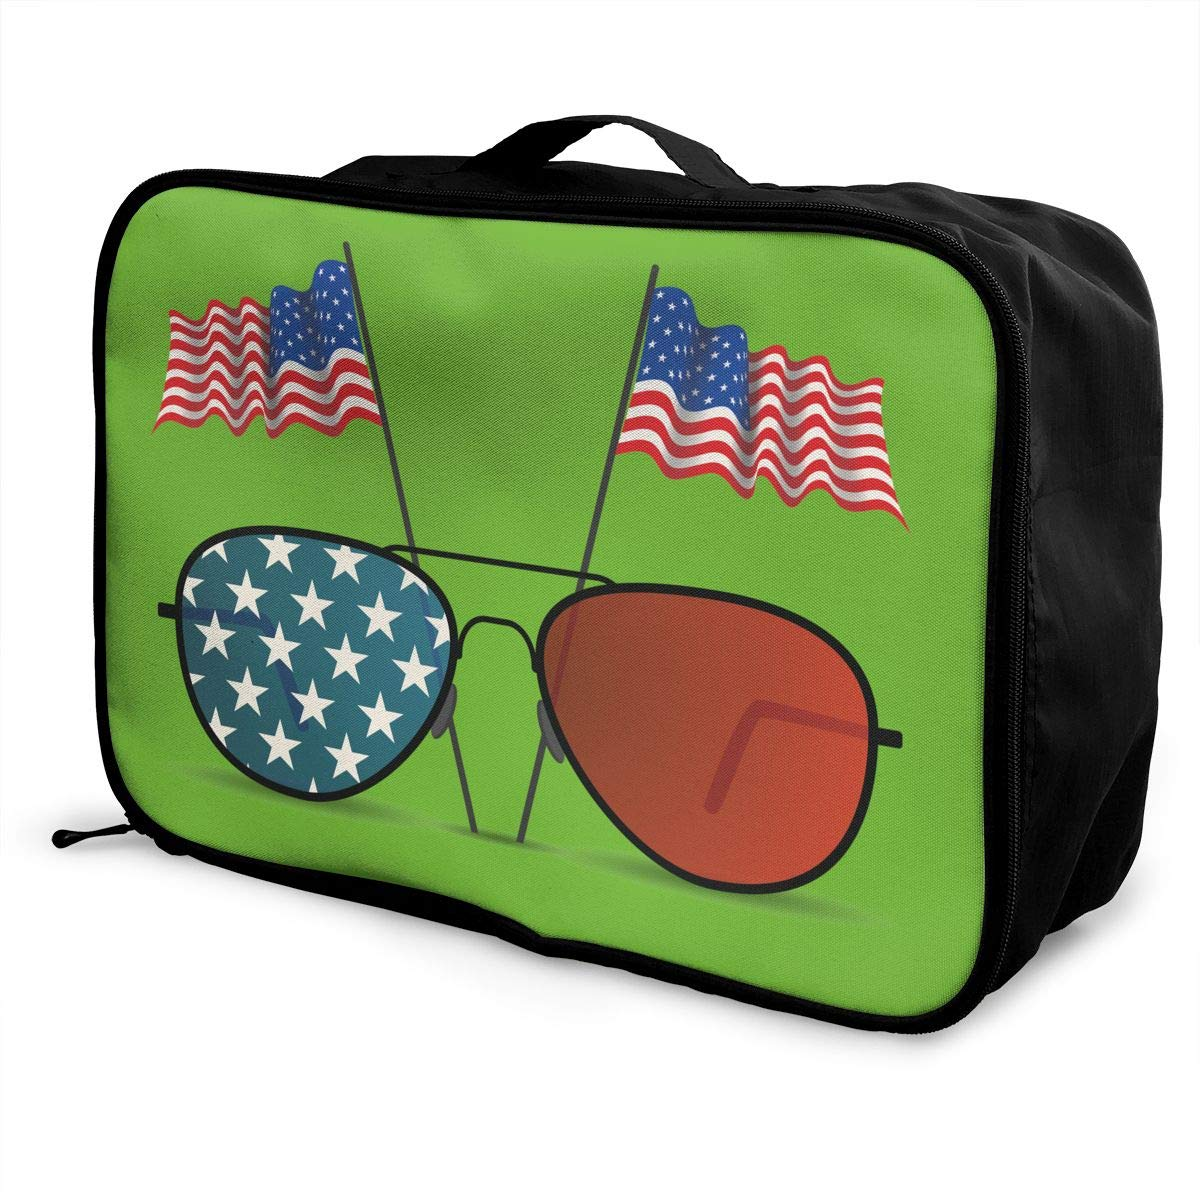 Travel Luggage Duffle Bag Lightweight Portable Handbag United States Flag Large Capacity Waterproof Foldable Storage Tote